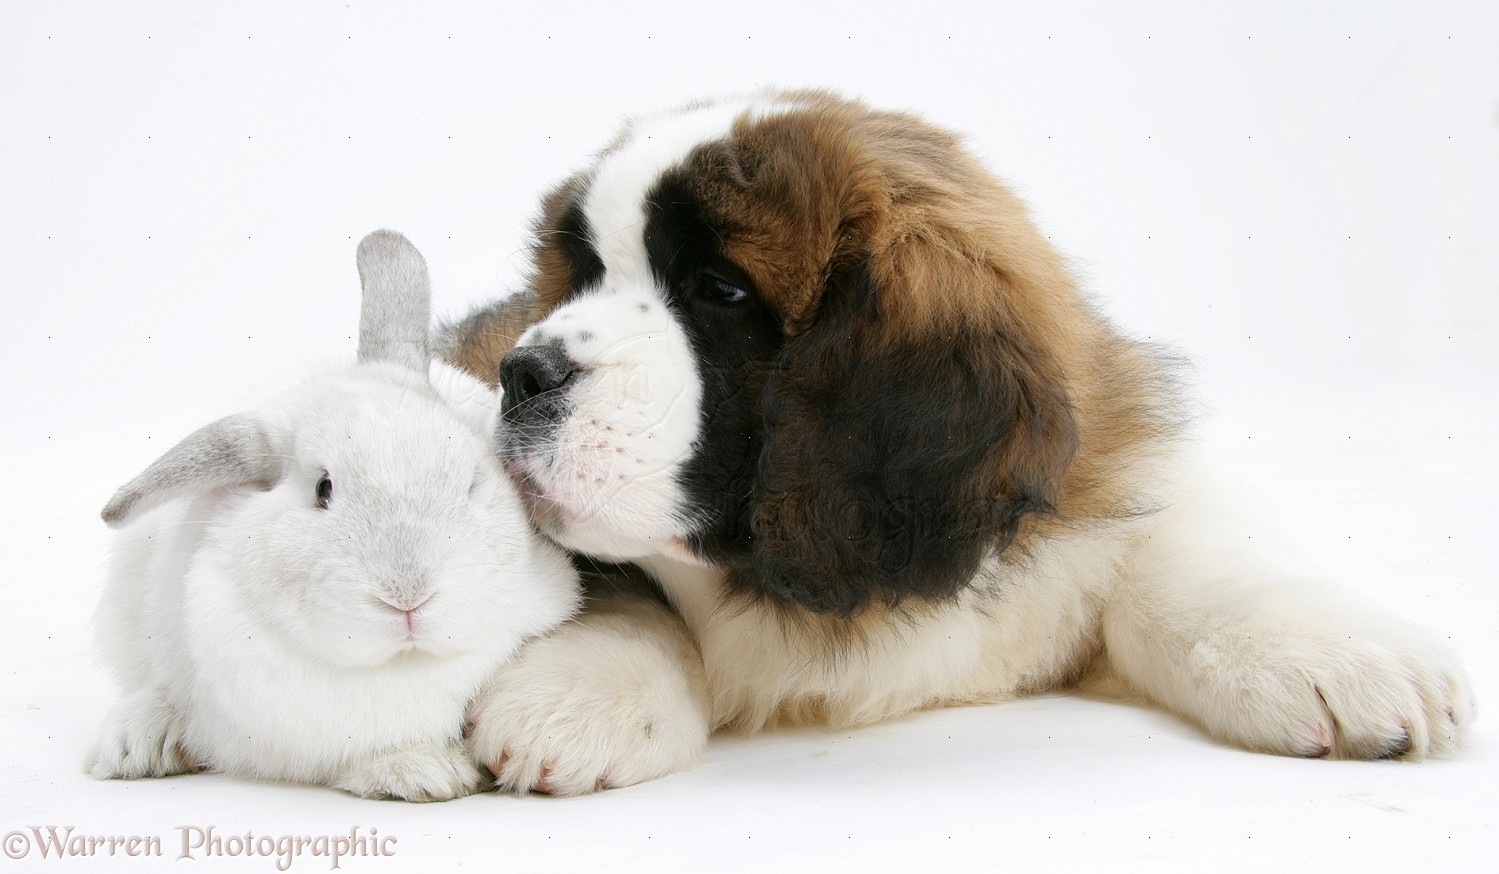 Pets Saint Bernard Puppy And White Rabbit Photo Wp21854